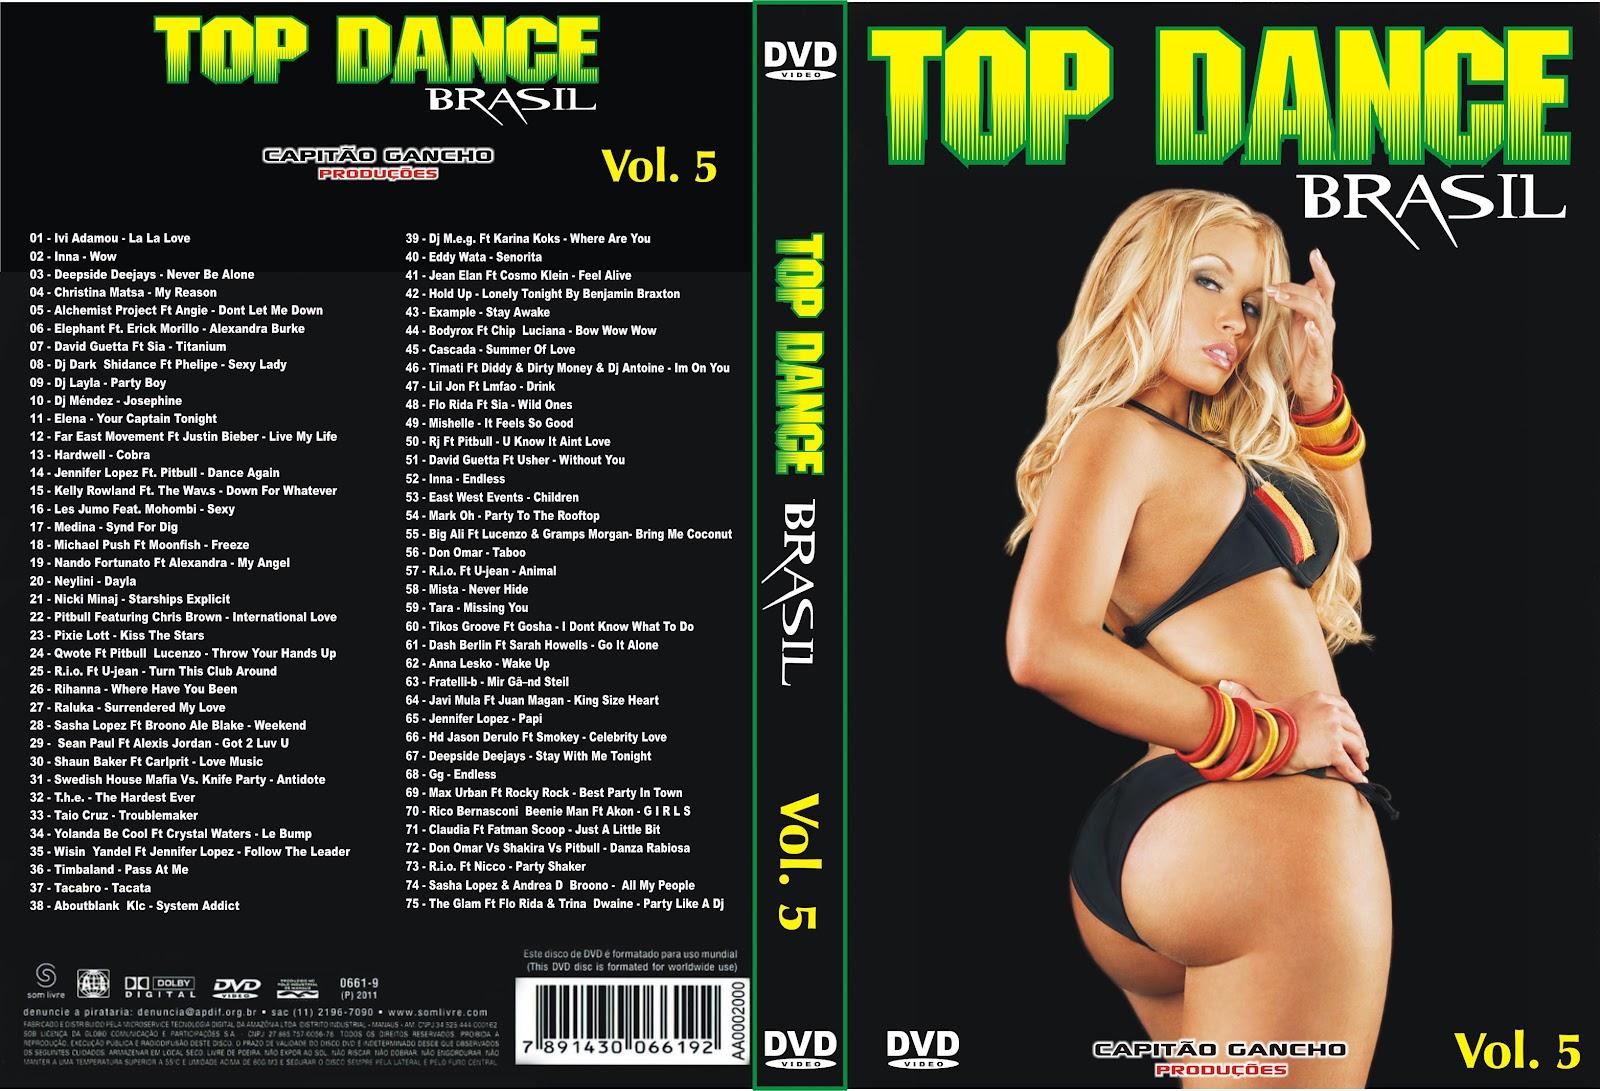 http://2.bp.blogspot.com/-EqHIsdlH7Fw/T-OTHKMJs3I/AAAAAAAAMys/ujTVlyNno0M/s1600/DVD-R+-+TOP+DANCE+BRASIL+VOL.+5+-+2012.jpg